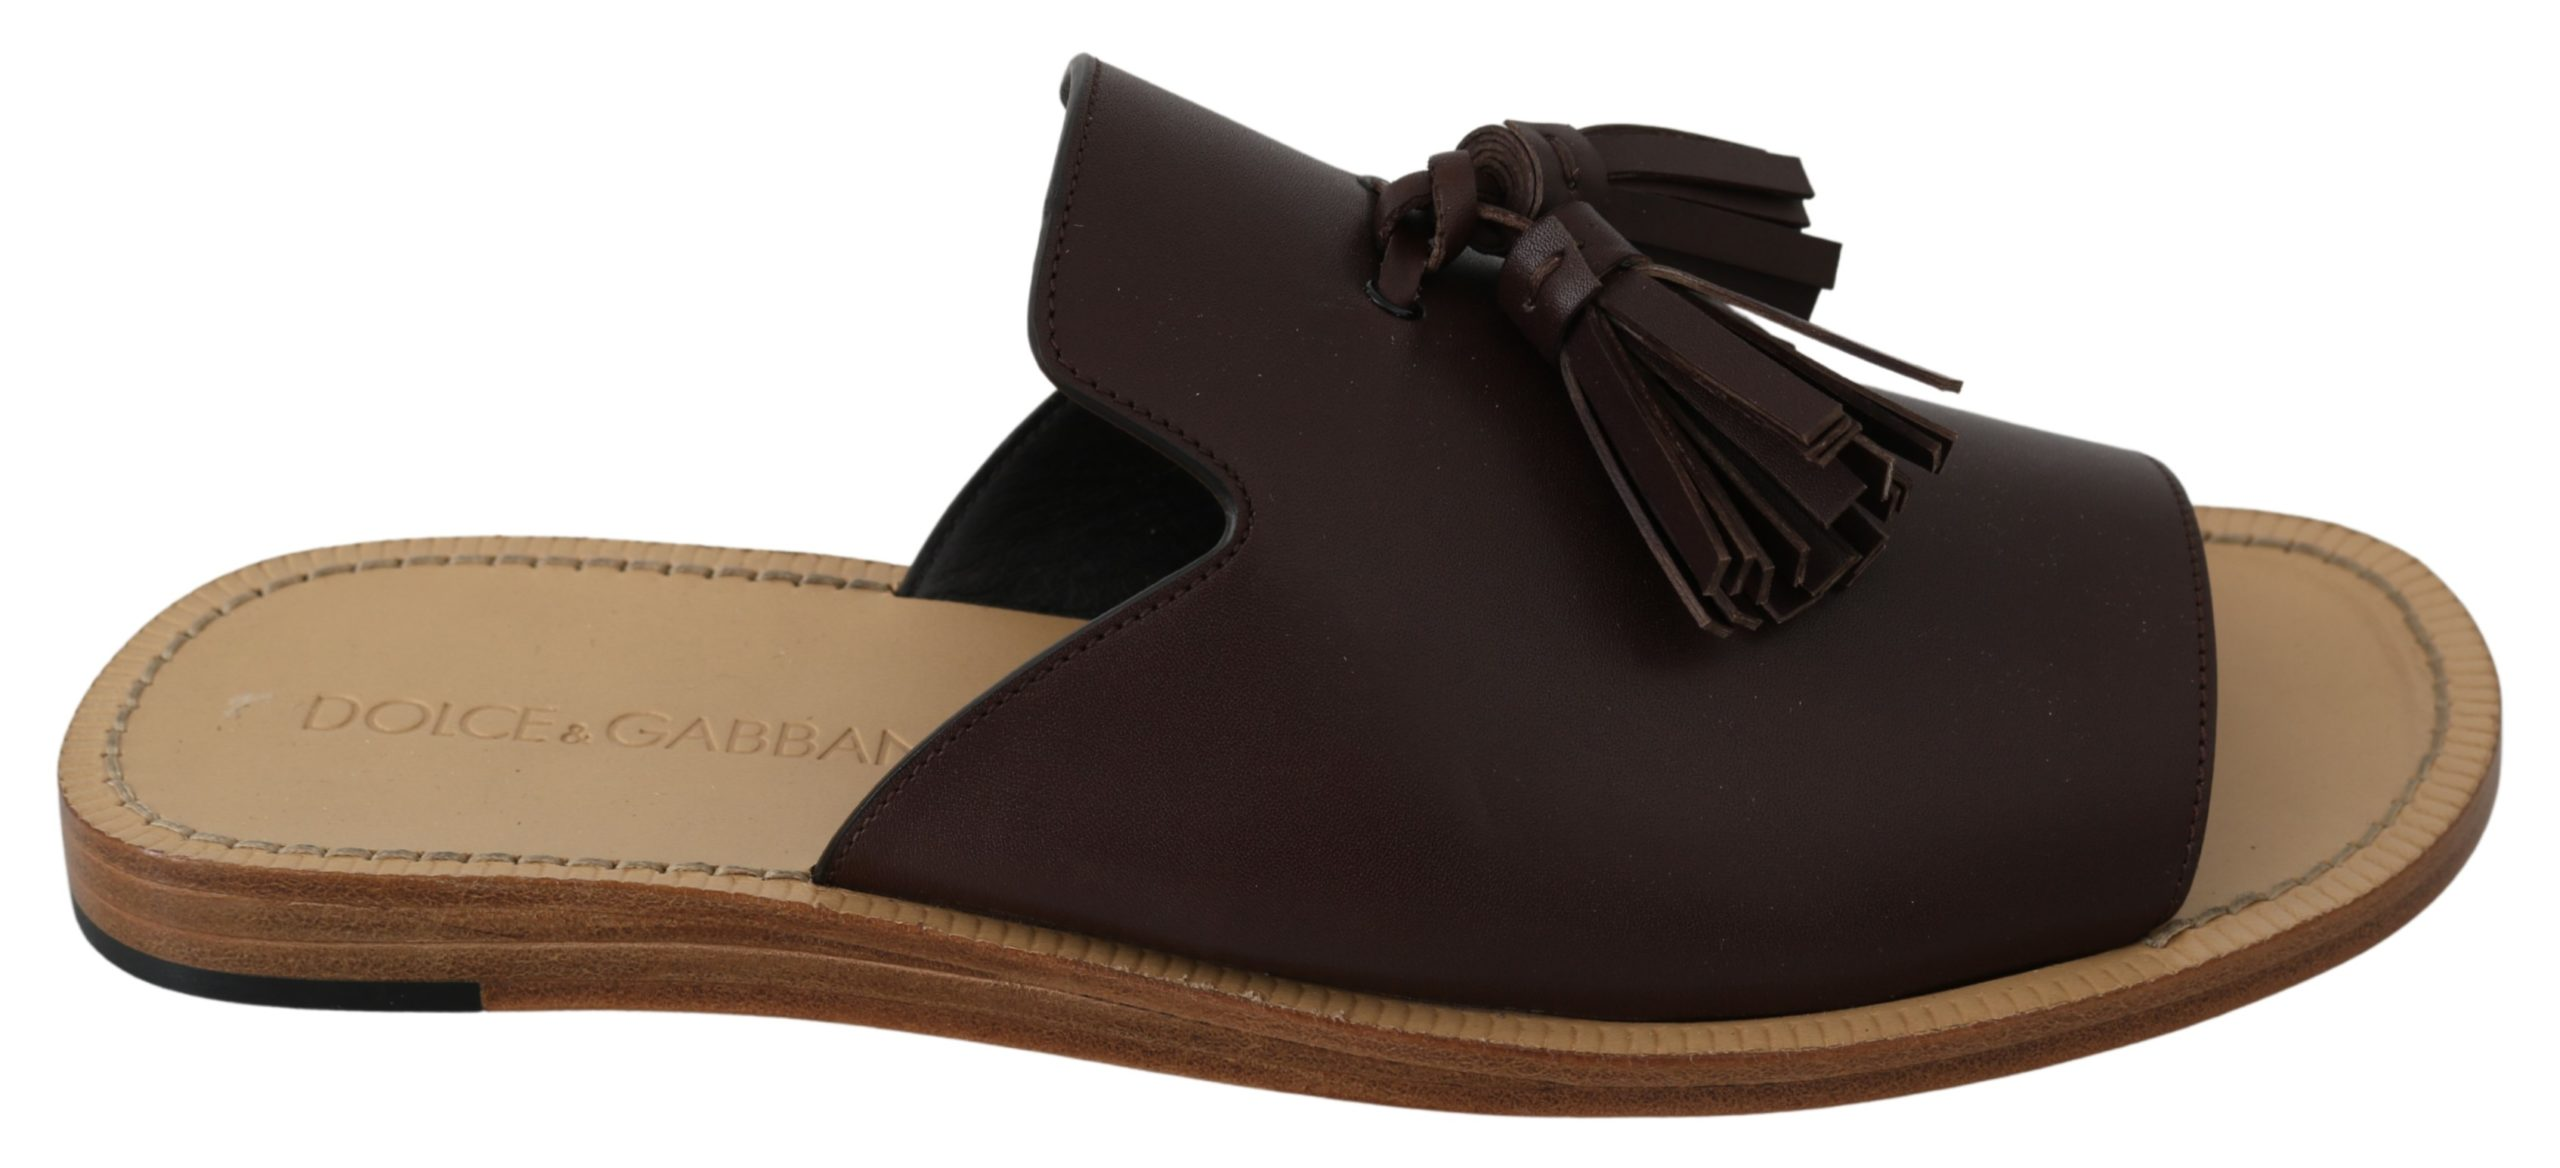 Dolce & Gabbana Men's Leather Open Toe Slides Sandal Brown MV3015 - EU44/US11